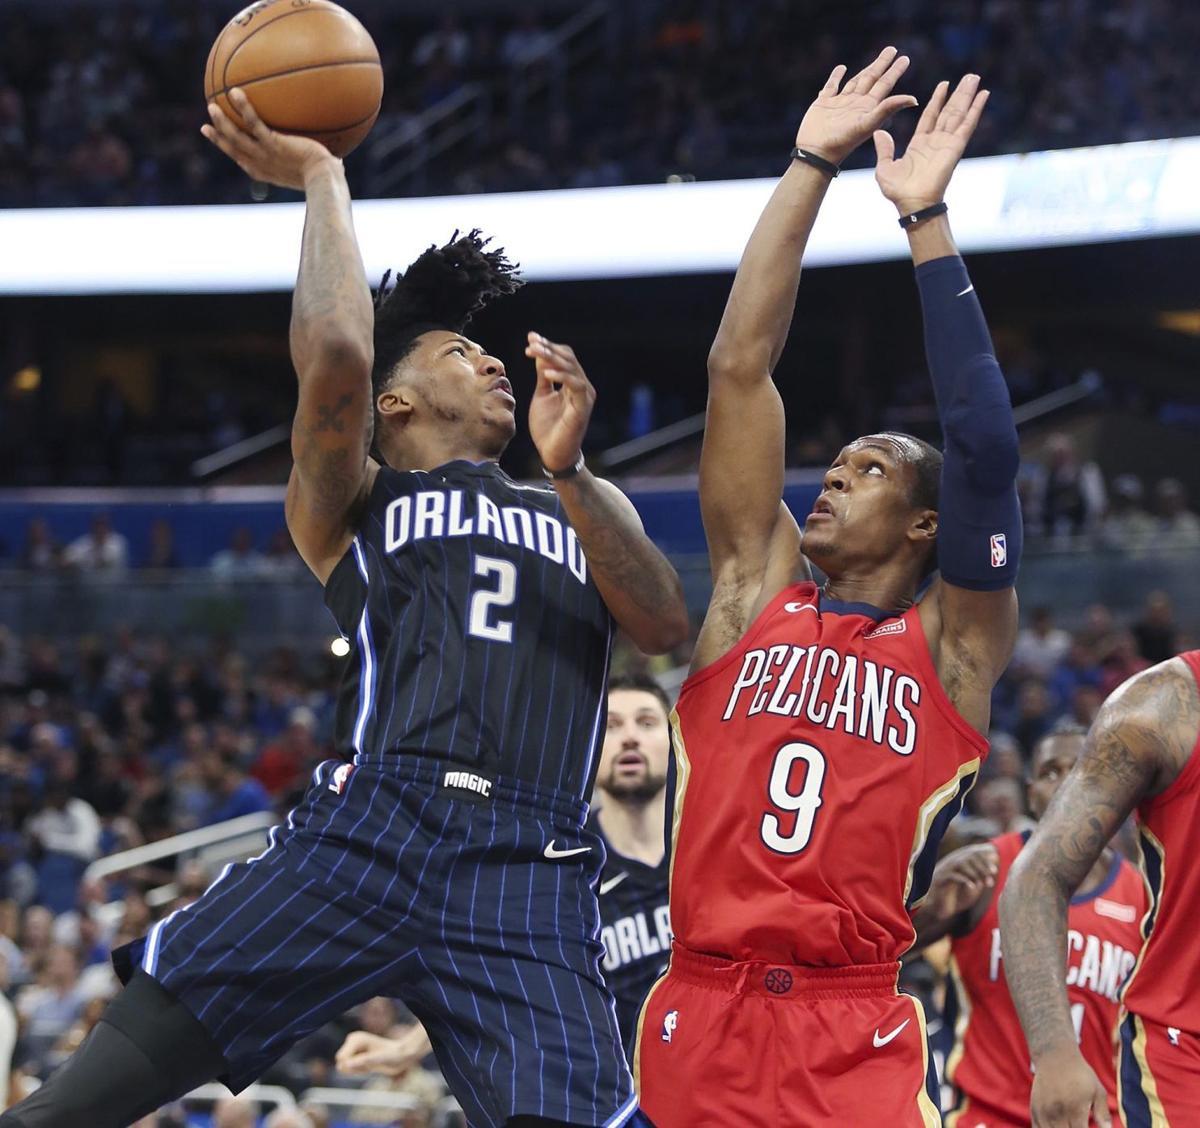 Pelicans Magic Basketball